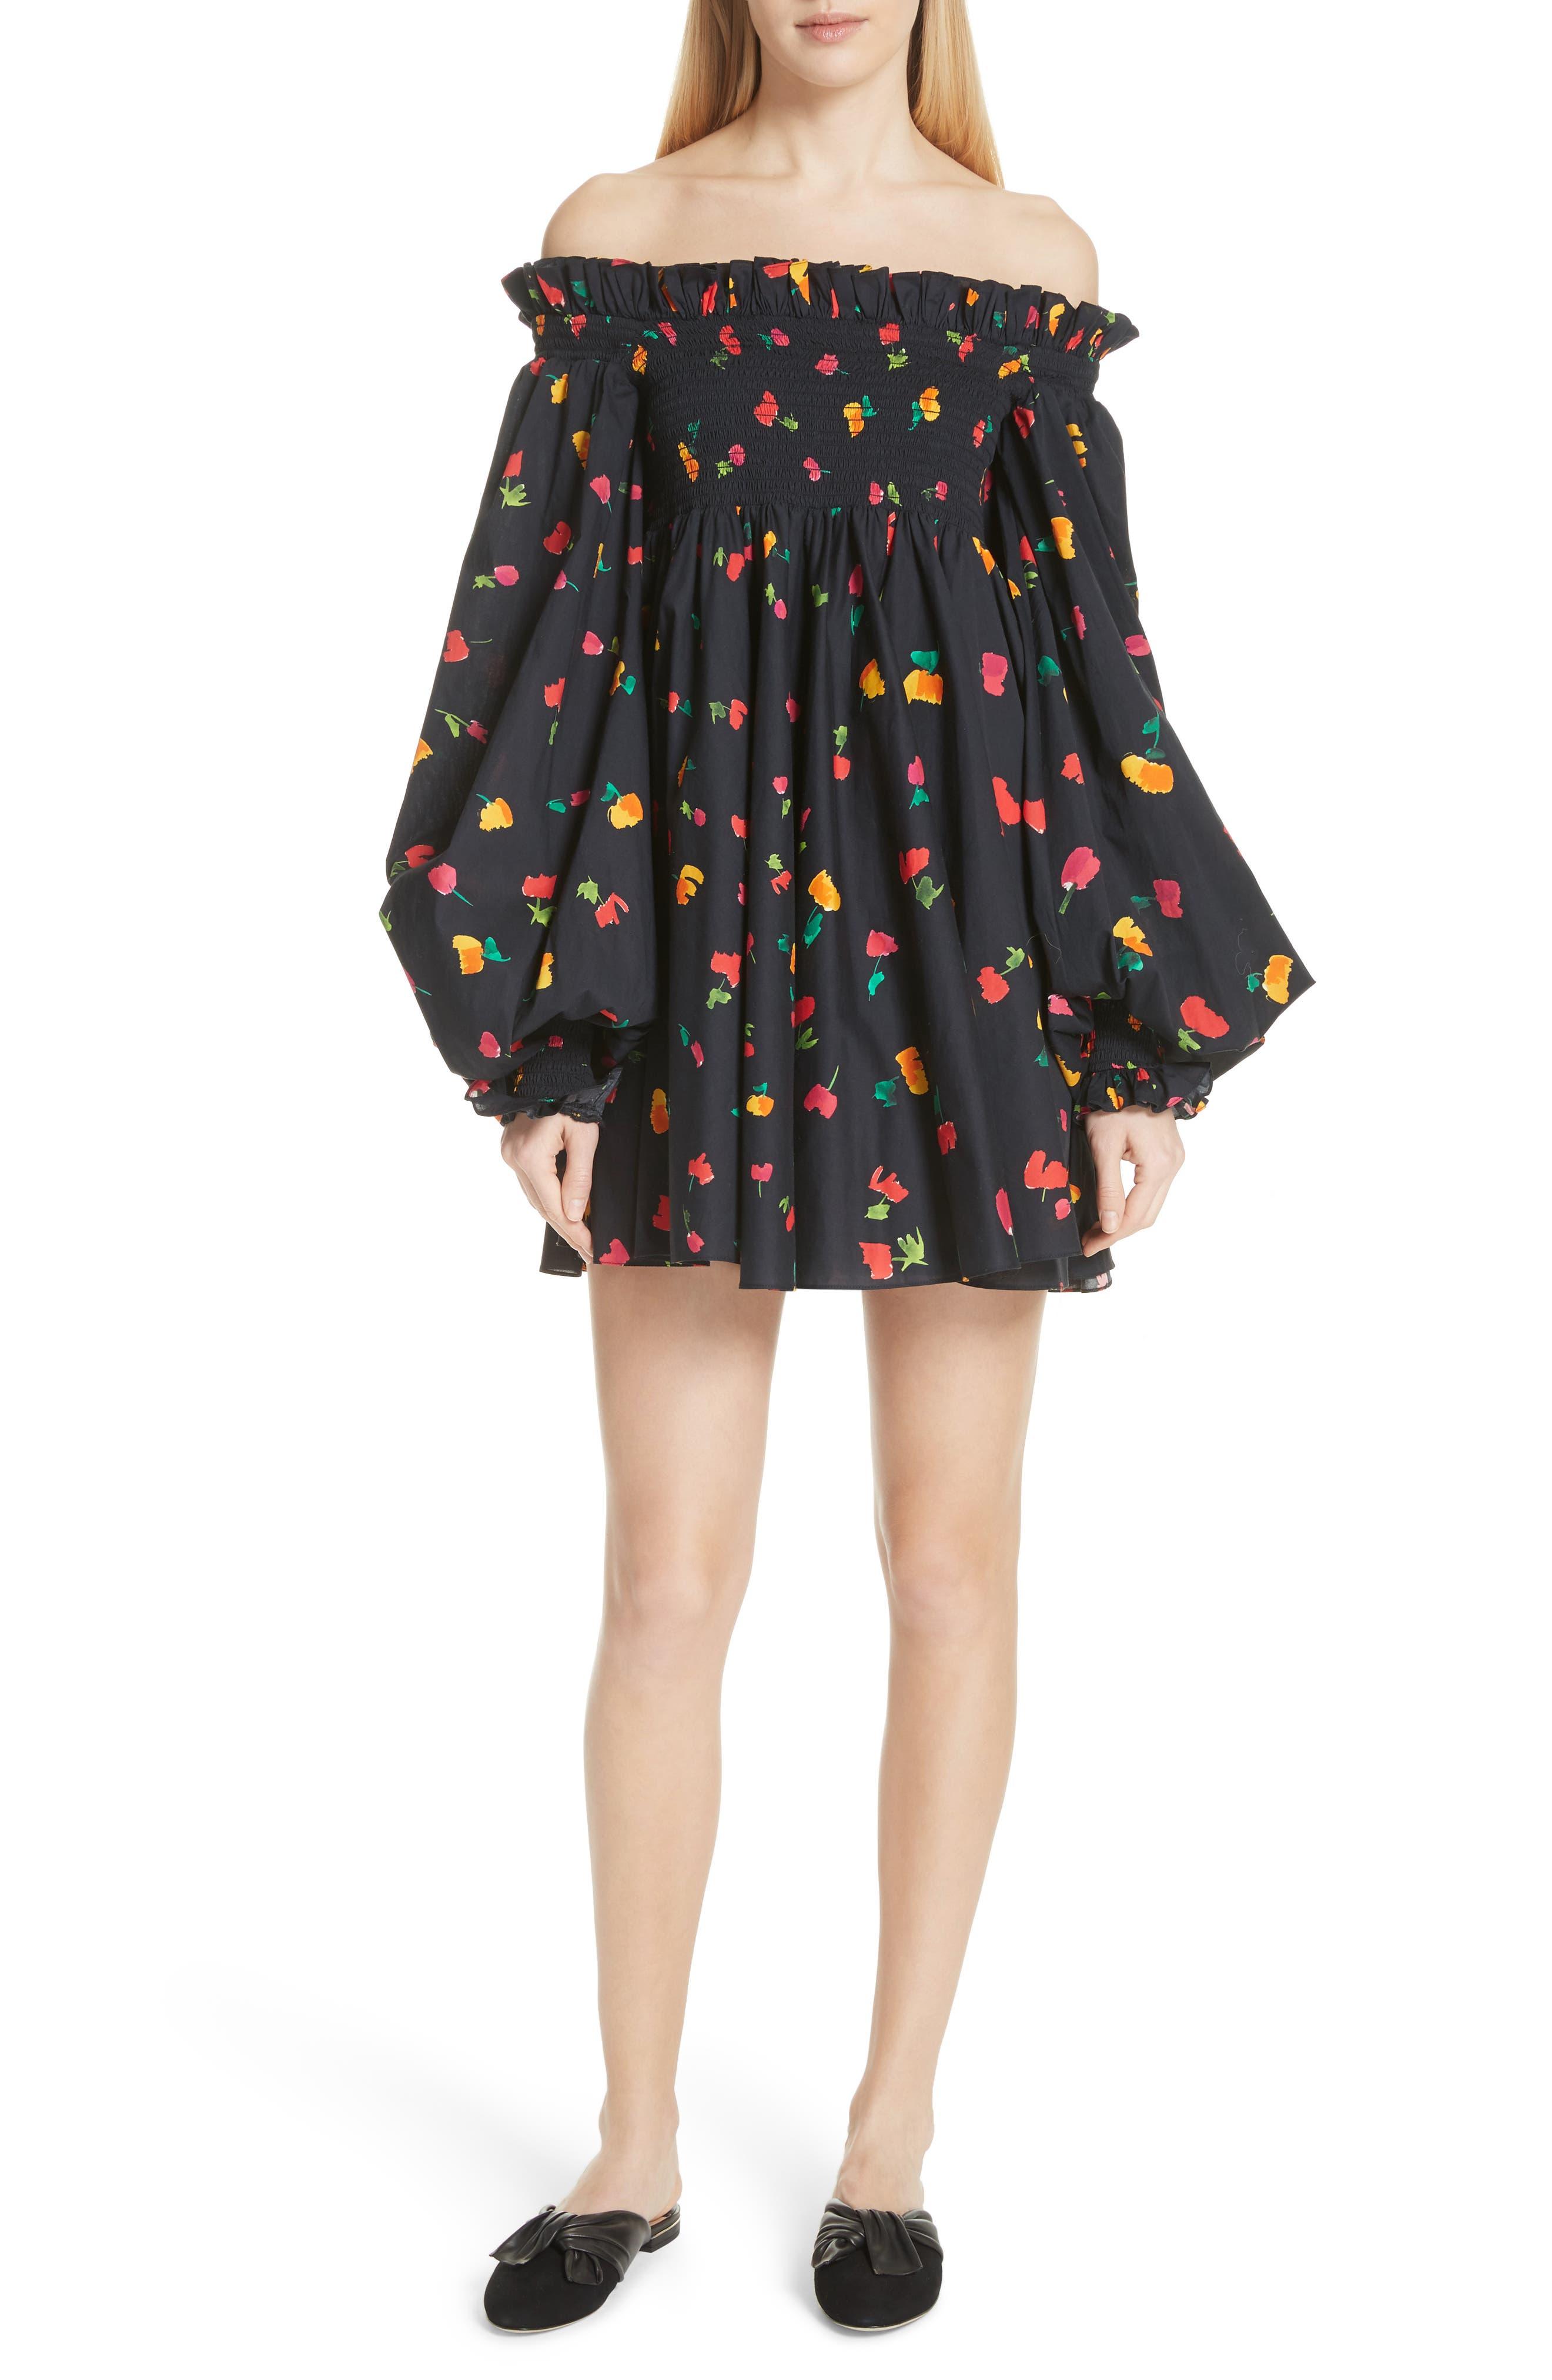 Kora Off the Shoulder Dress,                             Main thumbnail 1, color,                             BLACK